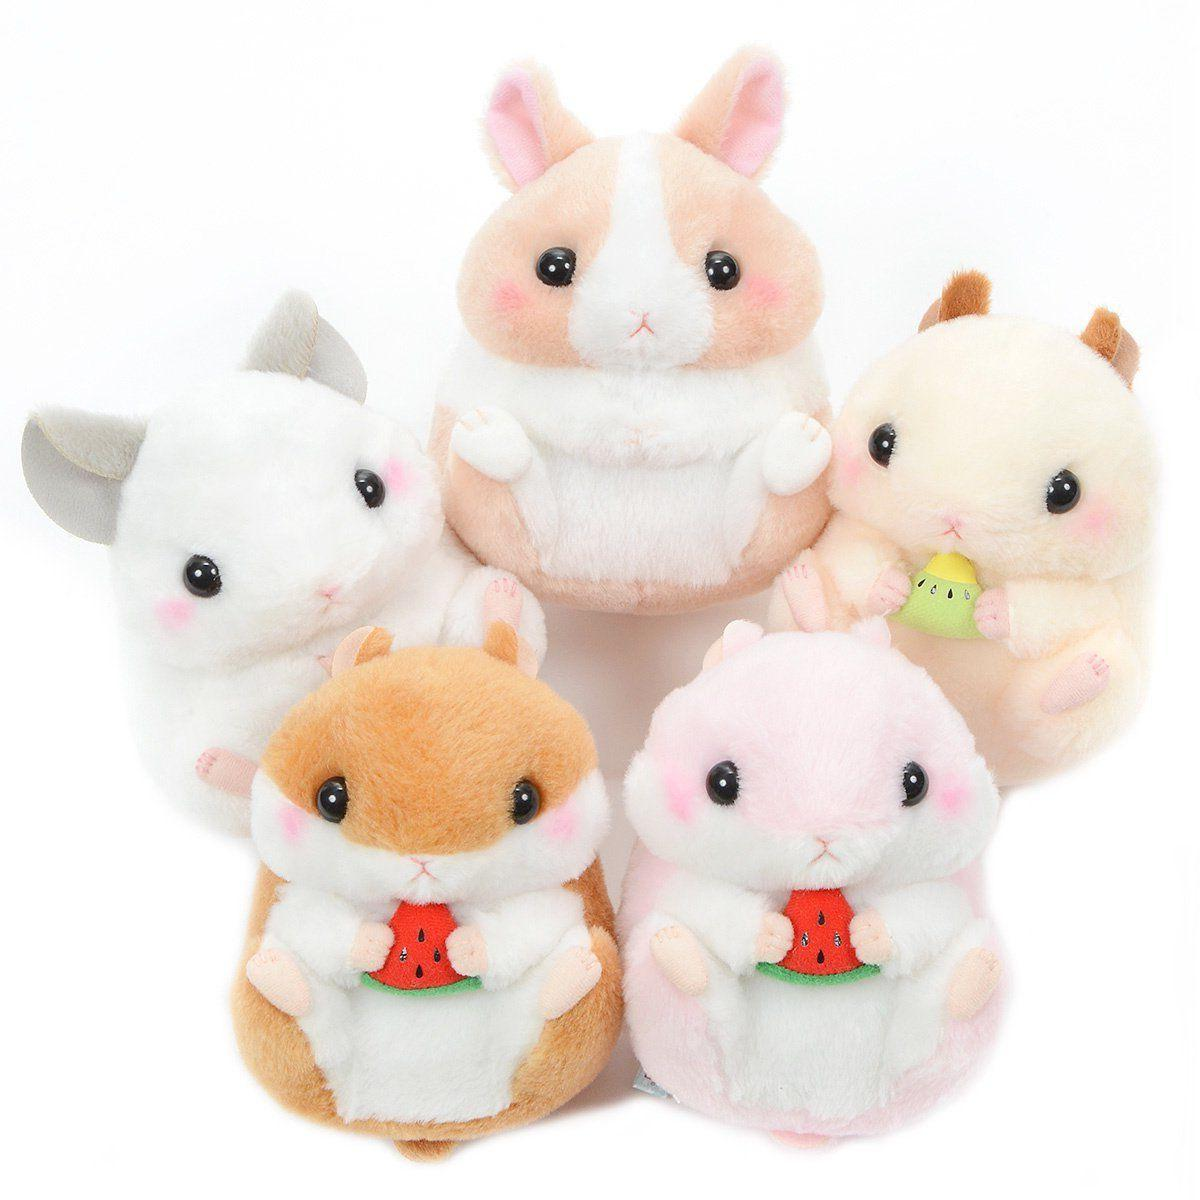 Hamster Plush Cute Stuffed Animal Size Amuse